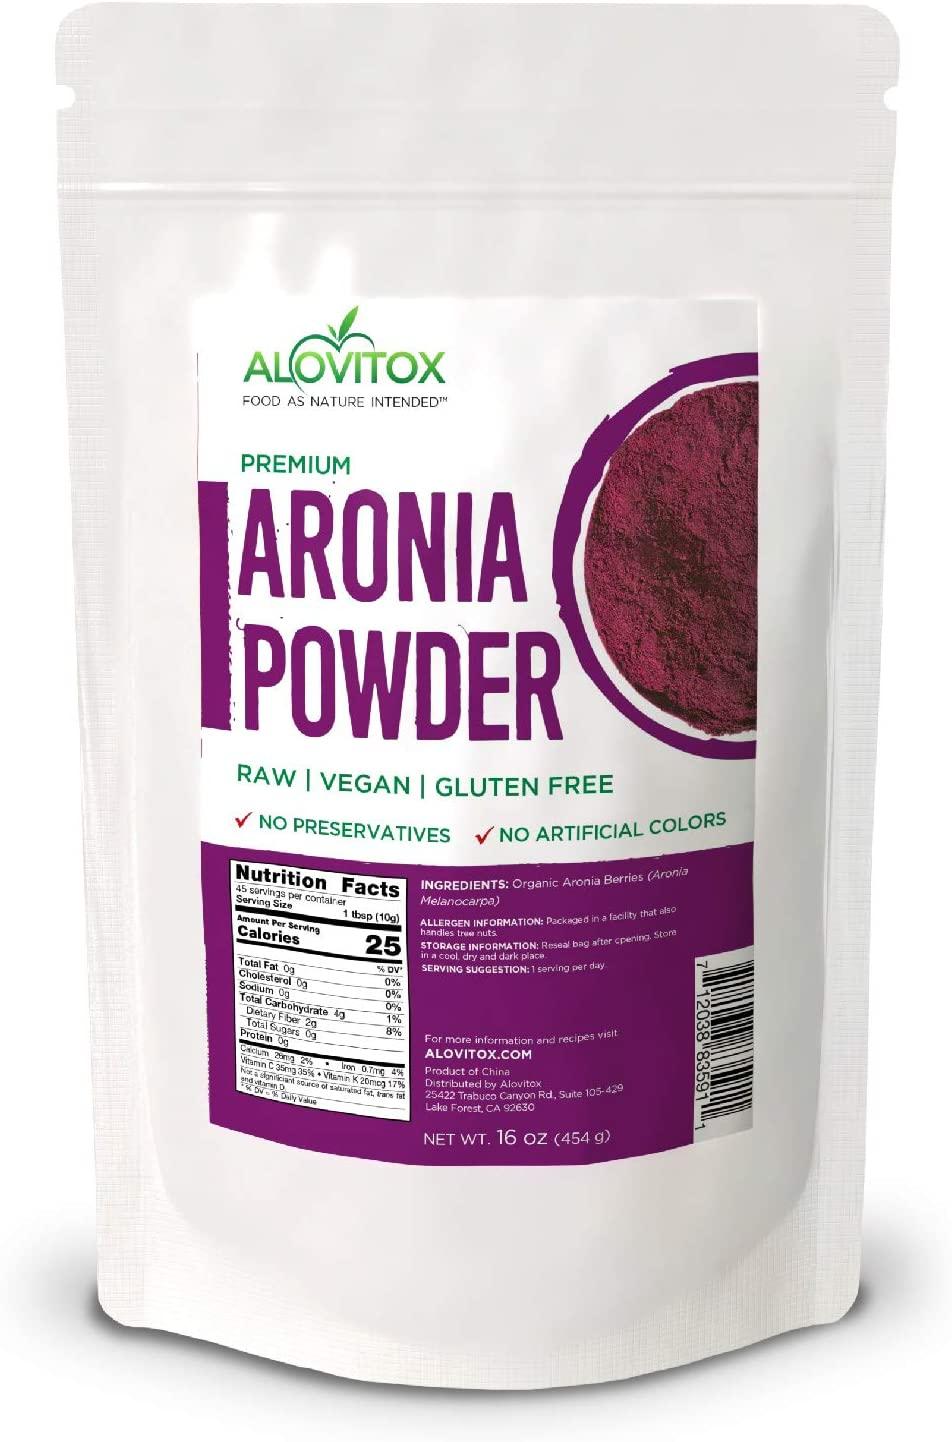 Aronia Juice Powder | Antioxidant Dense Superfood Naturally Containing Dietary Fiber, Vitamins A, K, C, and E, Calcium and Iron | RAW, Non-GMO, Gluten Free, Water Soluble RAW Aronia Juice Powder